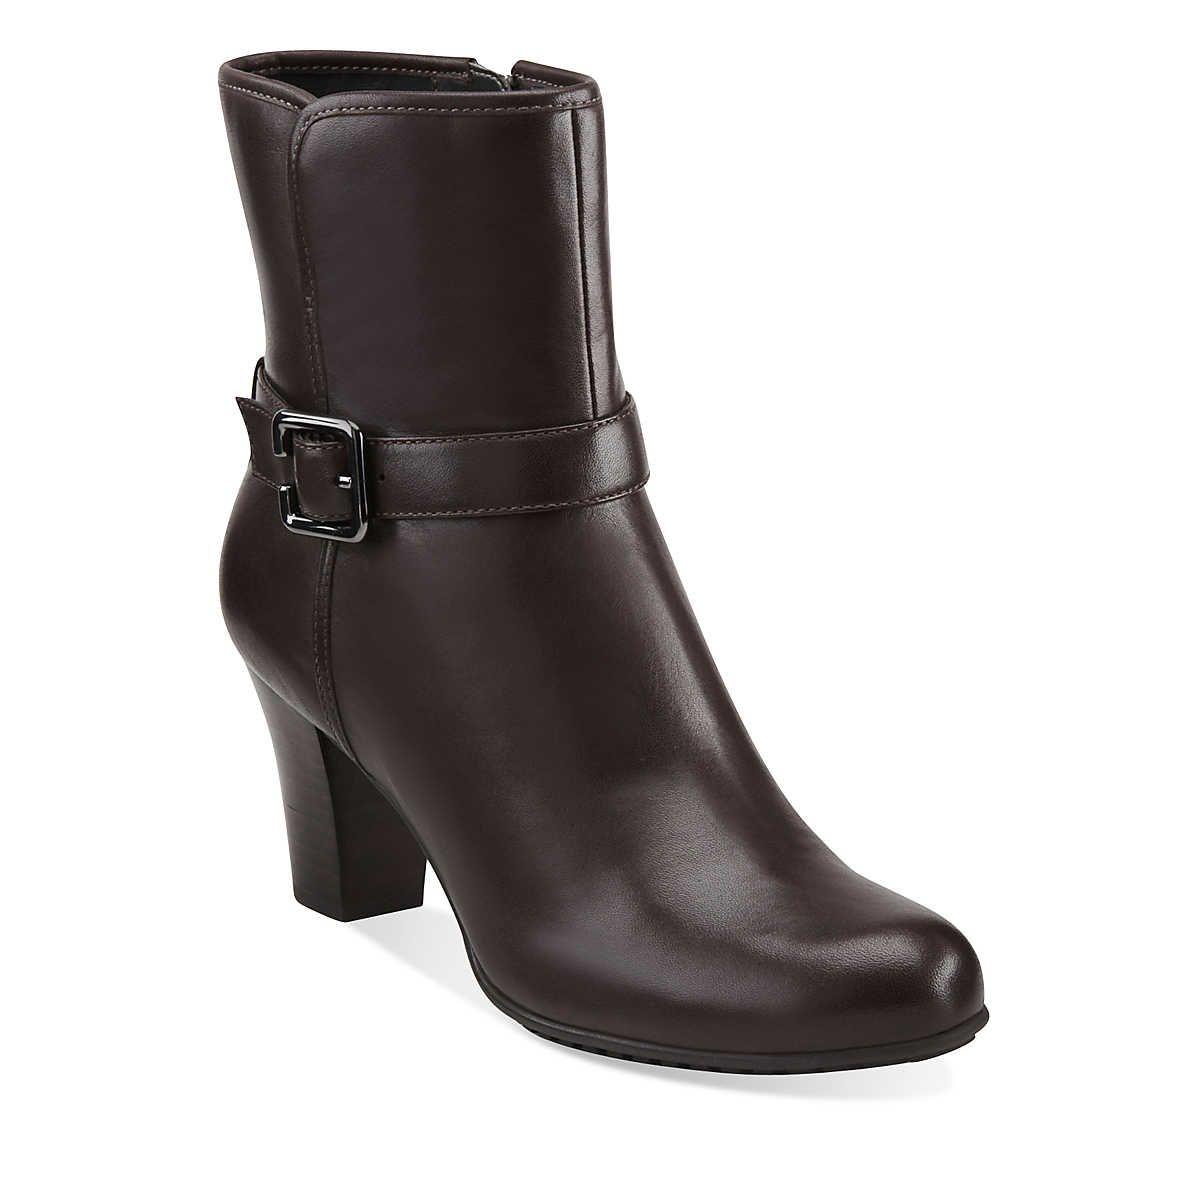 Clarks Shoes Official Site Comfortable Shoes Boots More Clark ShoesWomen s BootsShoe BootsDark Brown LeatherCowboy